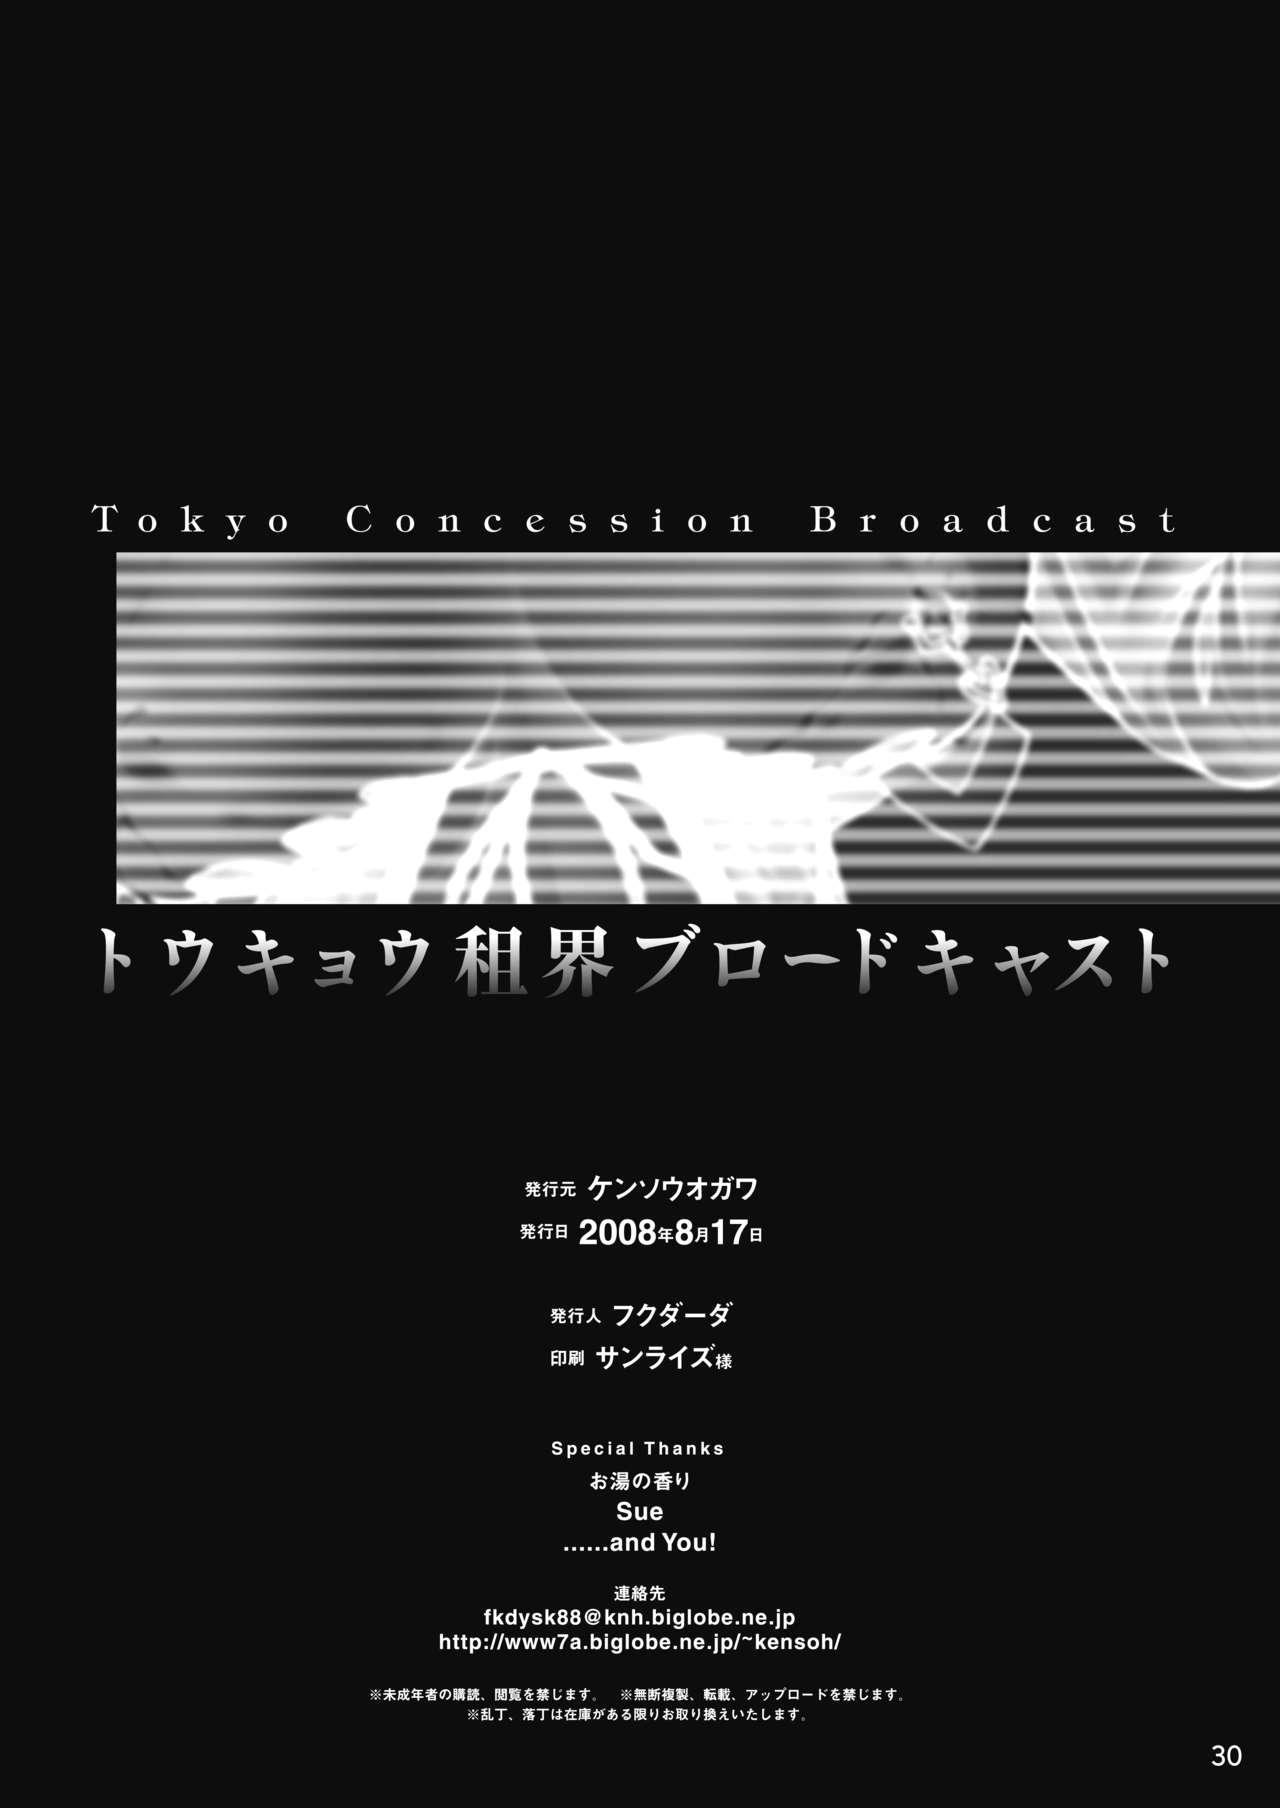 Tokyo Concession Broadcast 28